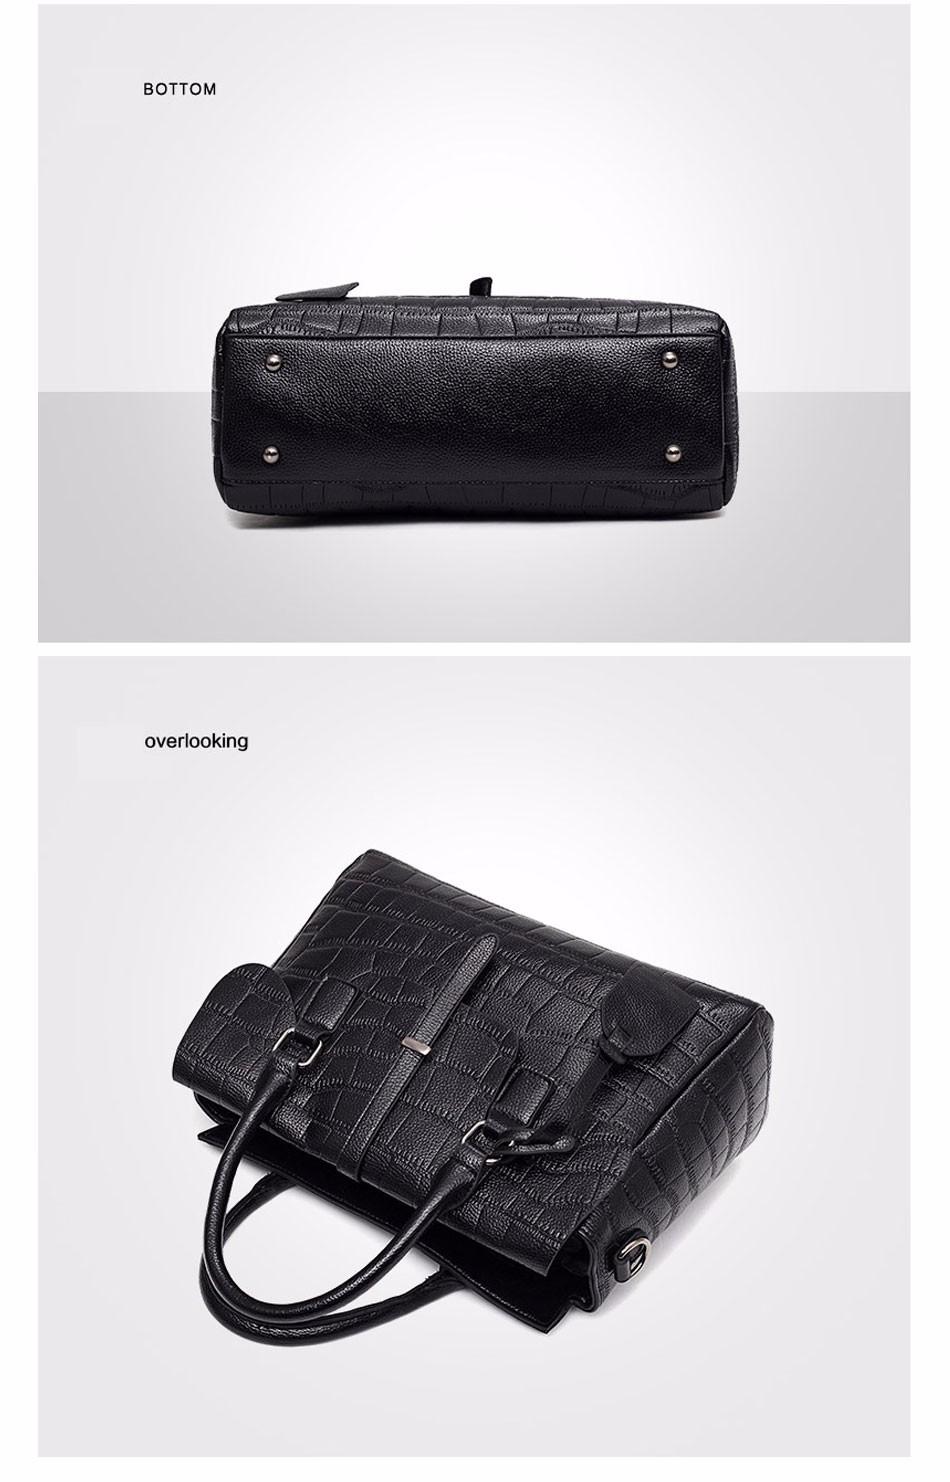 High Quality PU Leather Women's Handbags Shoulder Bag Ladies Hand Bags Stone Casual Women Bag Large Capacity Handbag 17 Sac 12